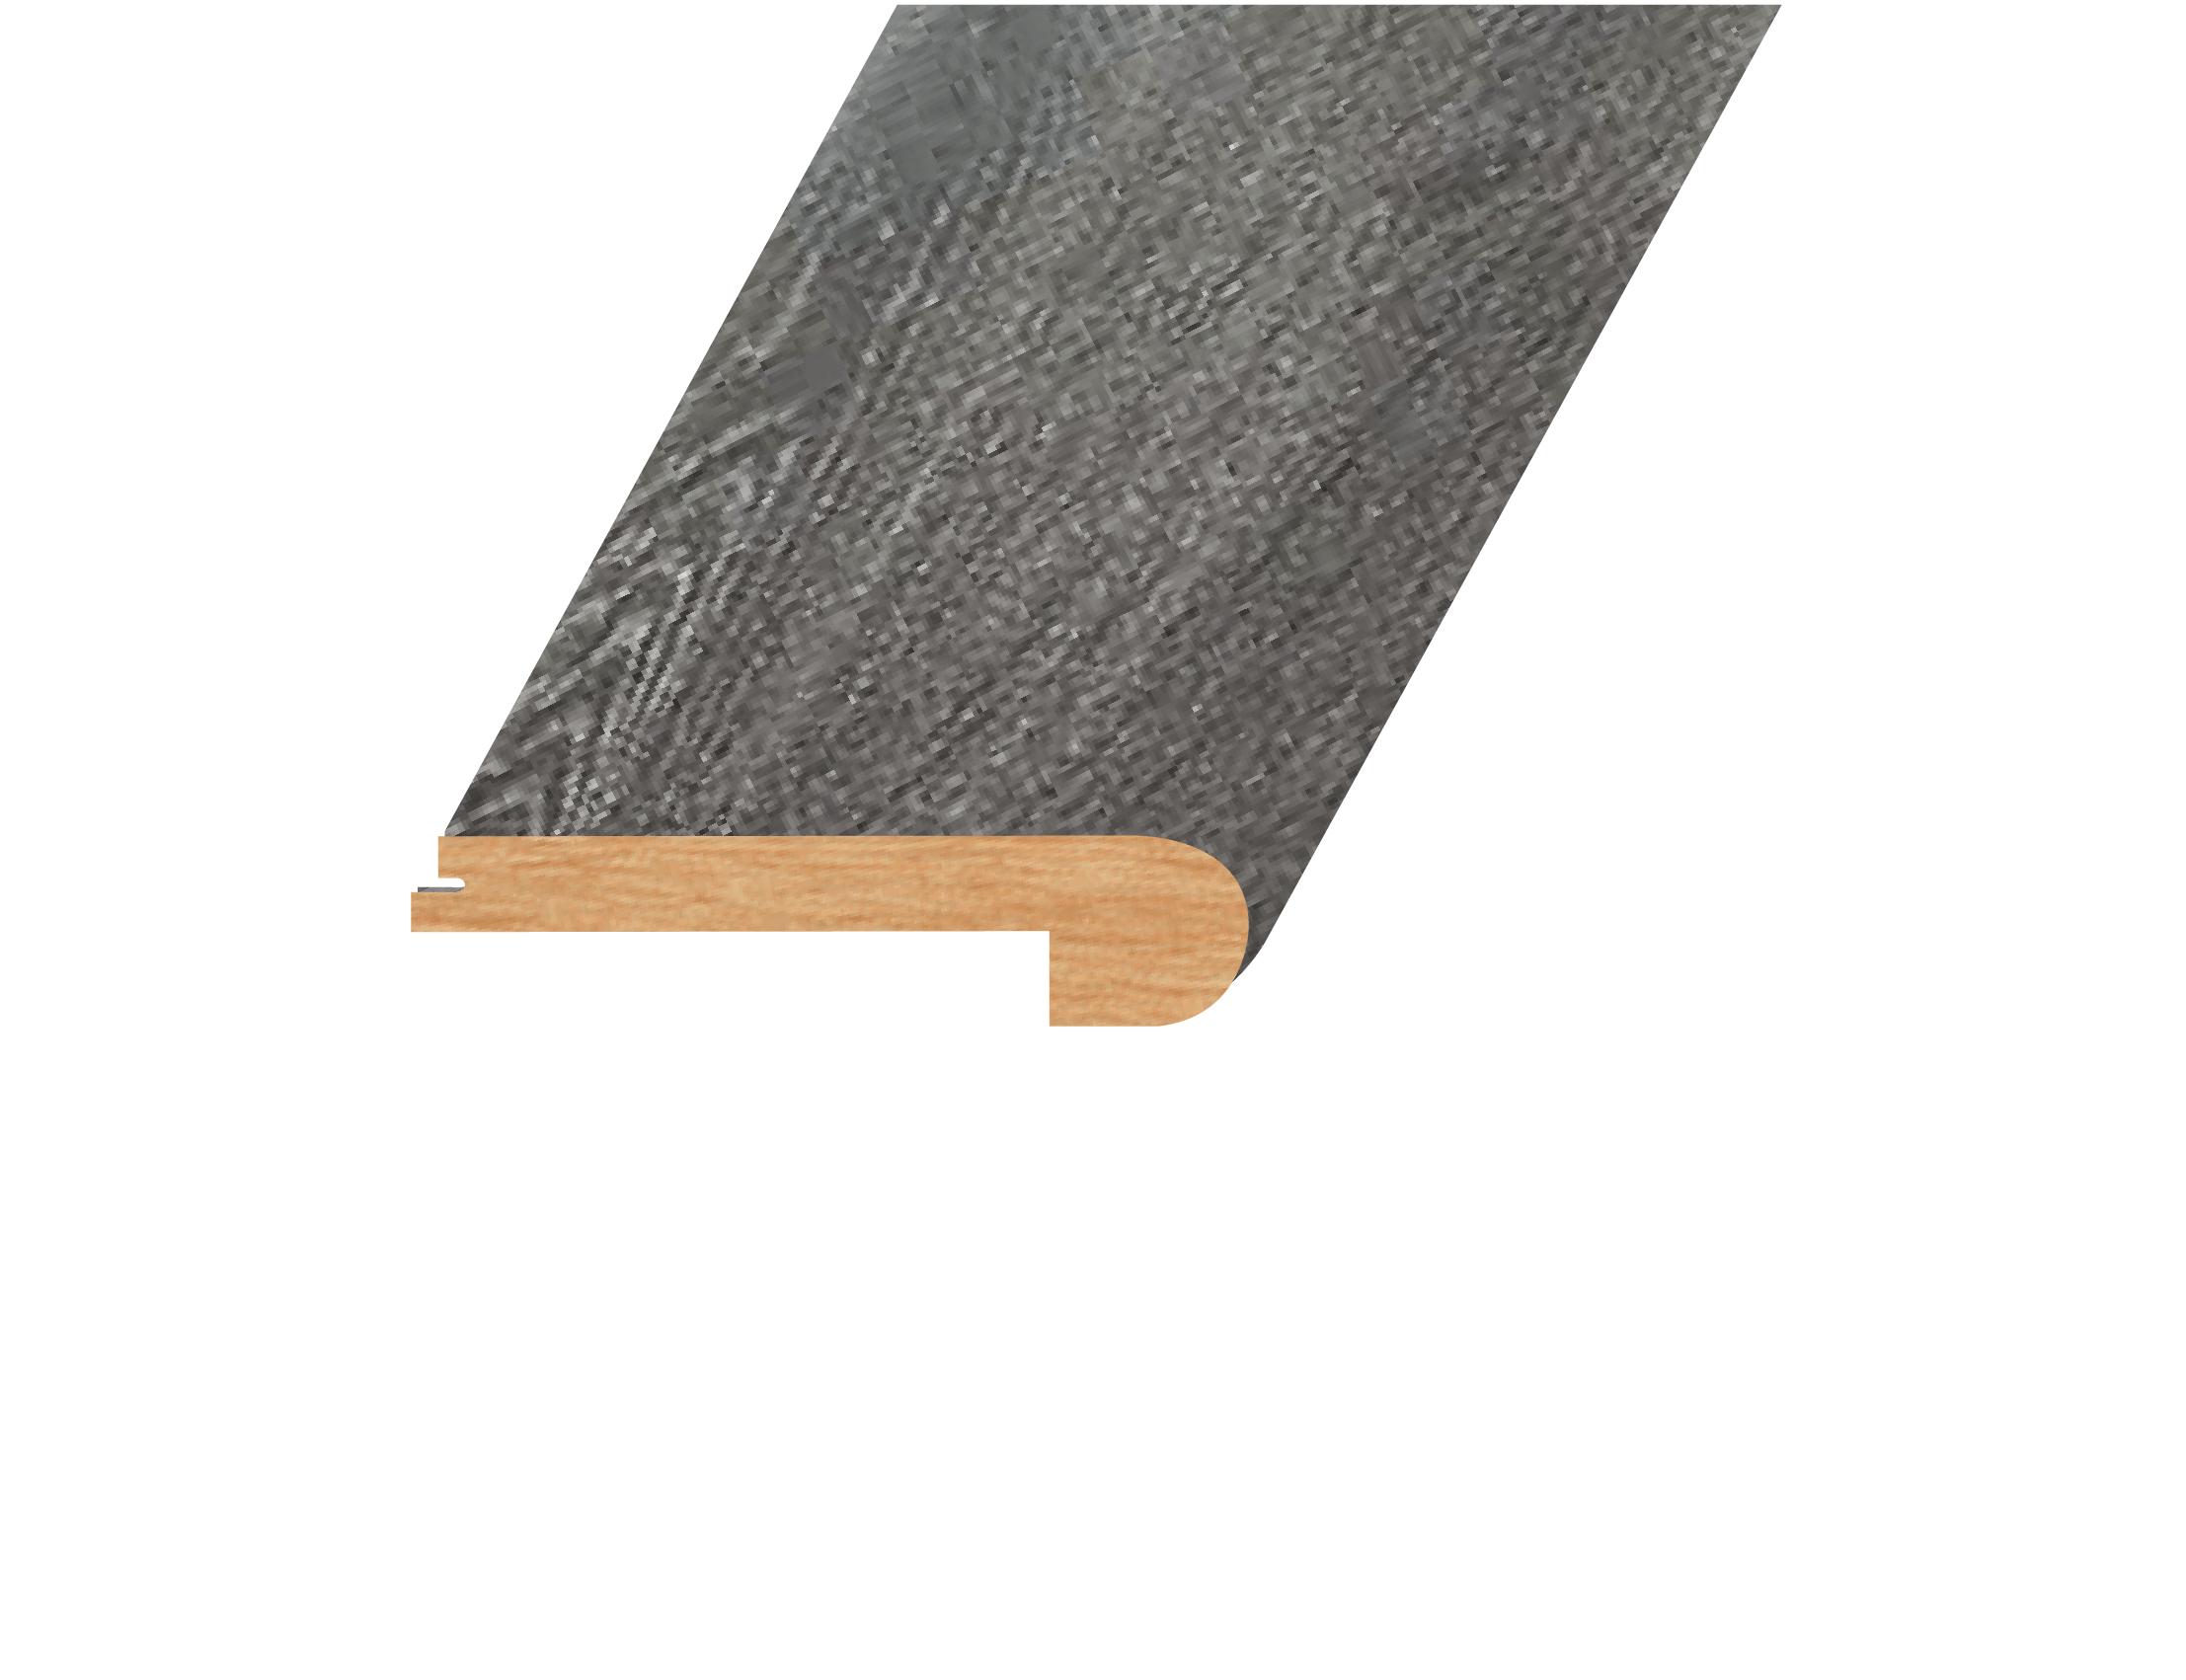 "Gainsboro Slate / Flush Stairnose / 94.5"" x 4.5"" x 1"" Laminate Moldings - 12mm Novus Collection 0"